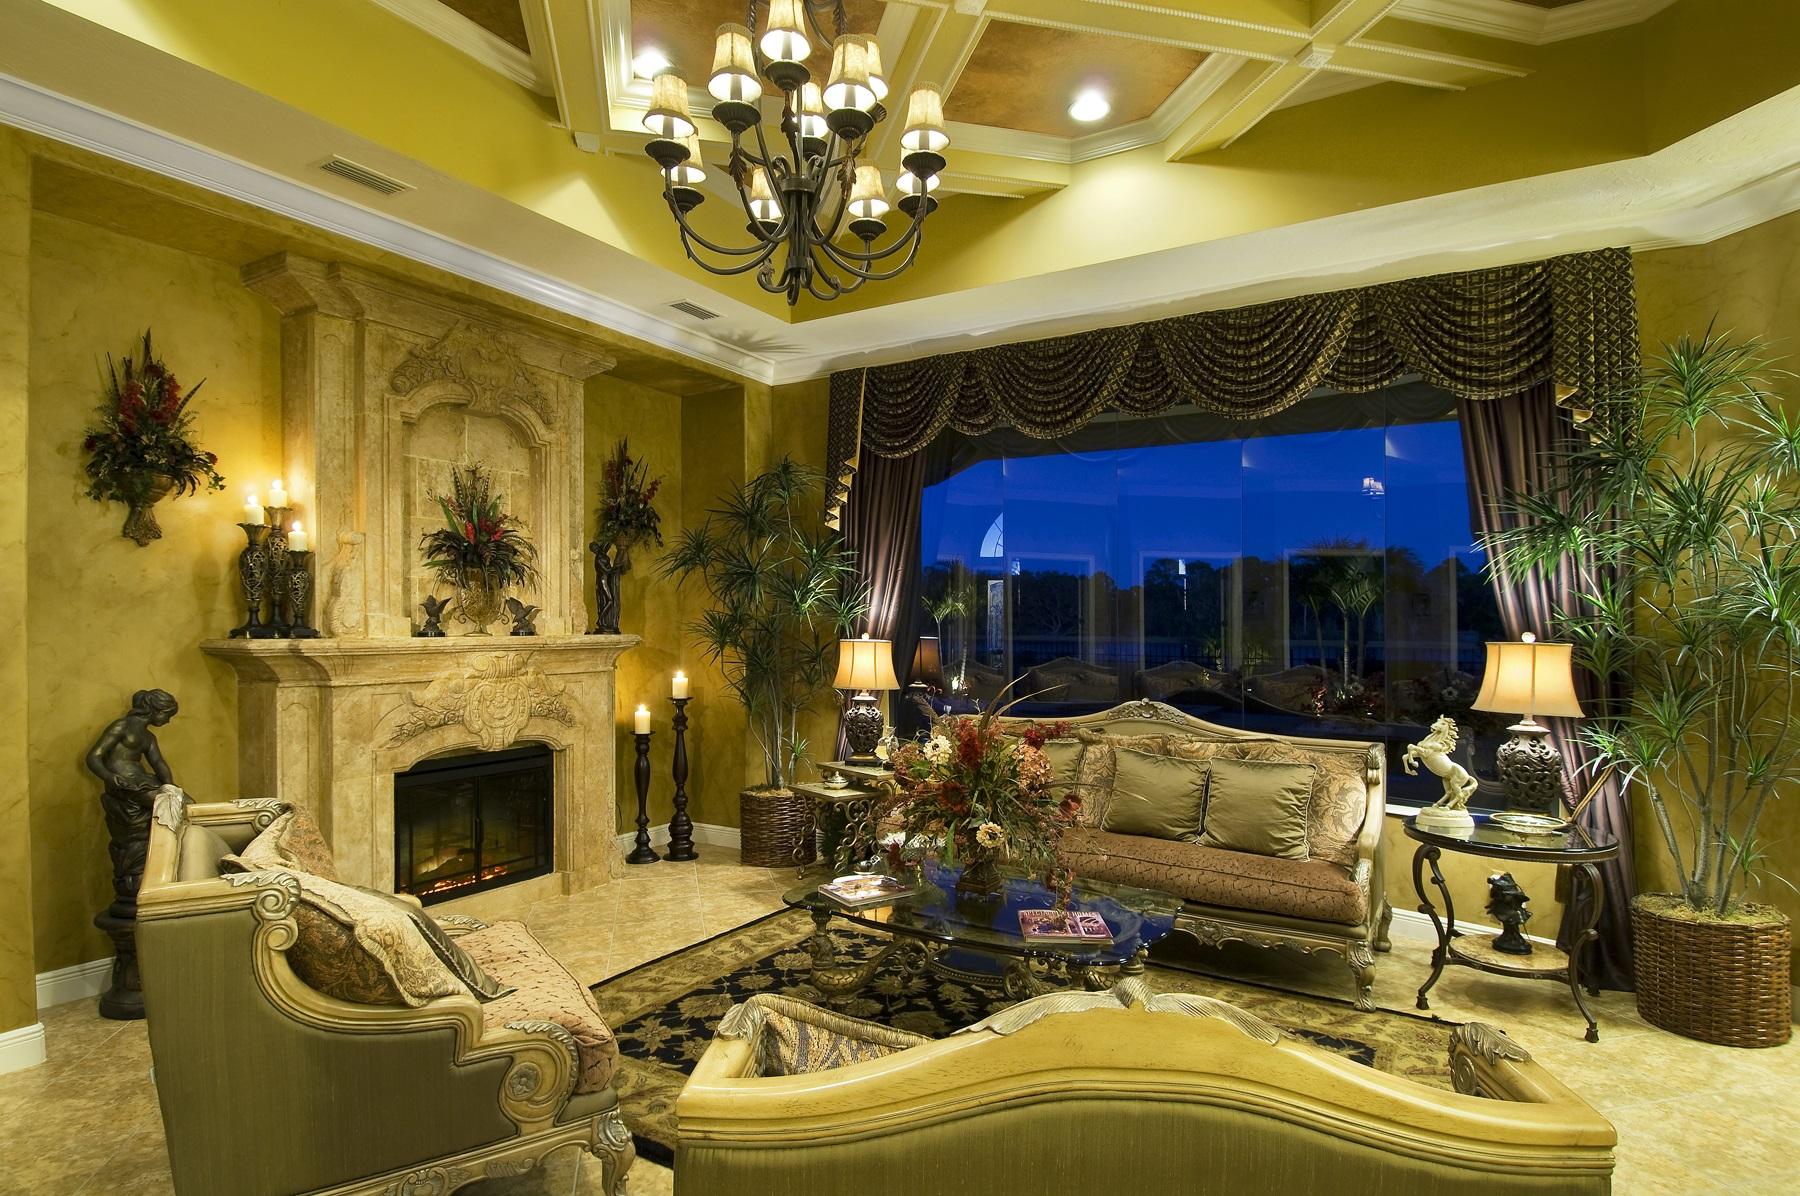 Home decorita pk home decor pakistan - Florida interior decorating ideas ...